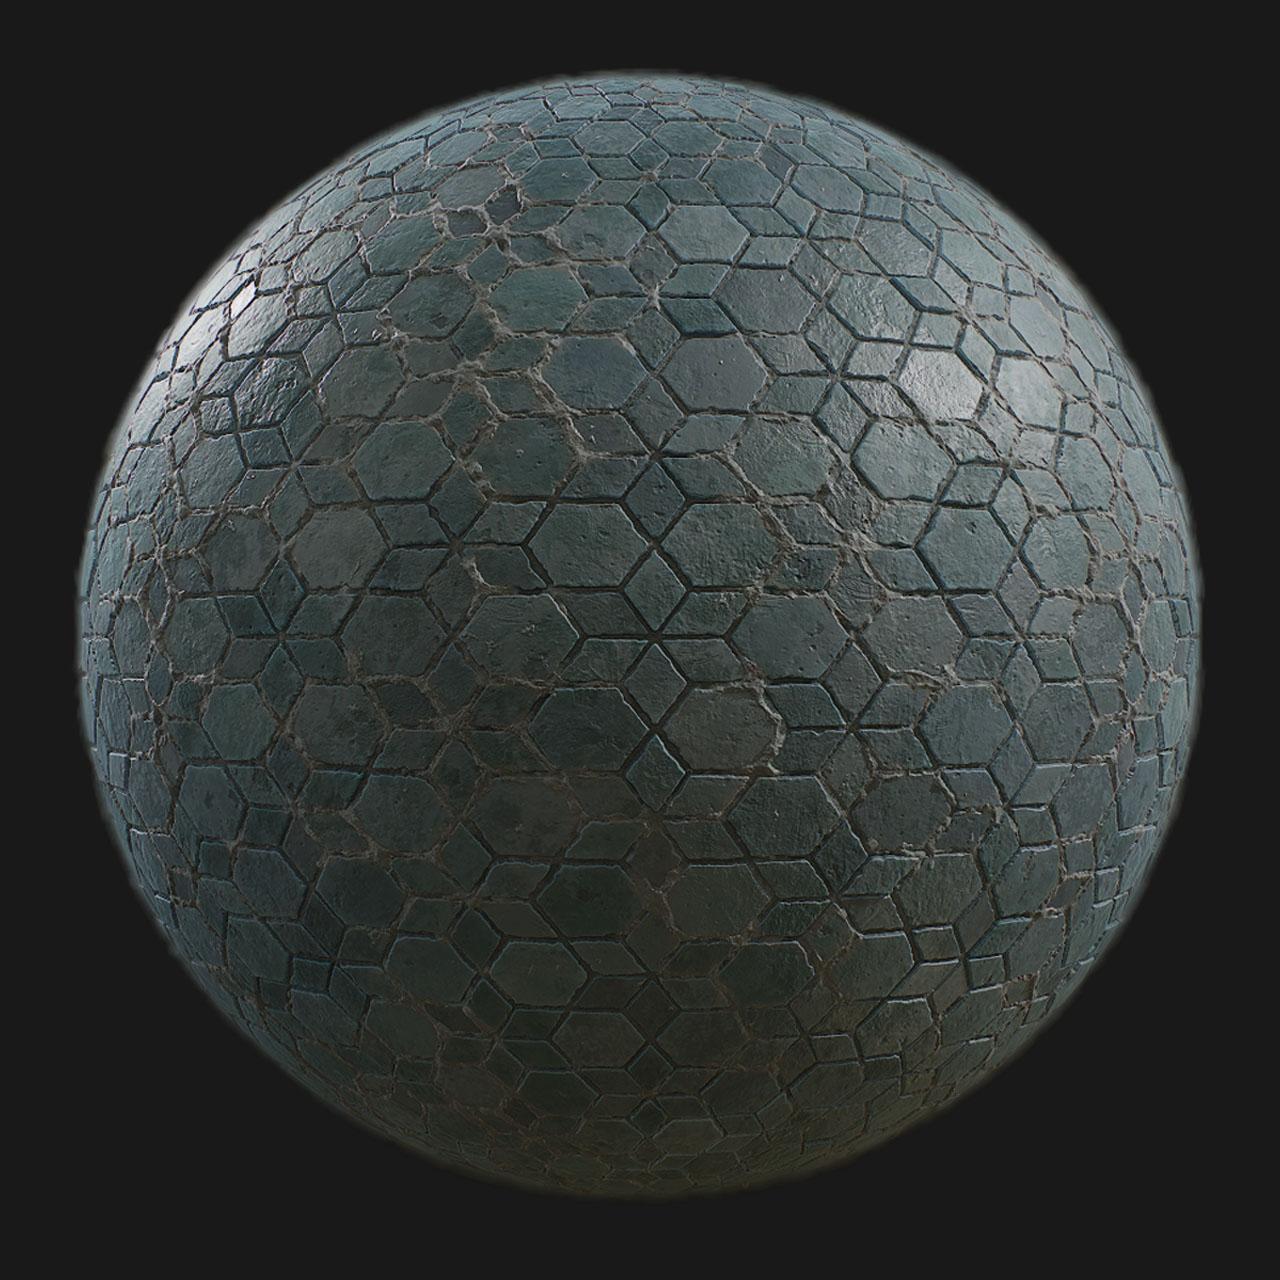 HexagonTiles_Thumb.jpg